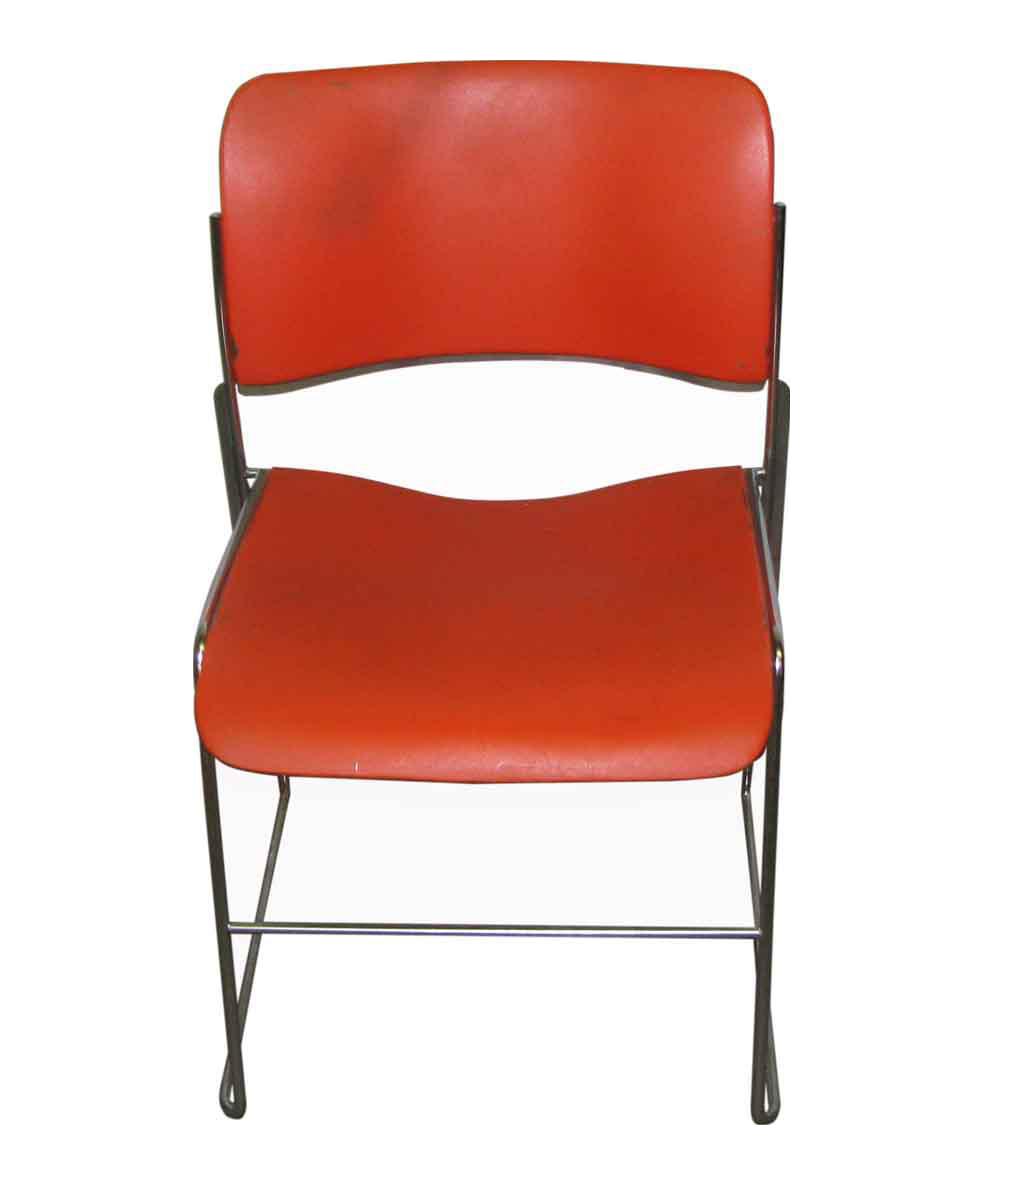 Retro Metal Plastic Stacking Chairs Set Of 3 Chairish